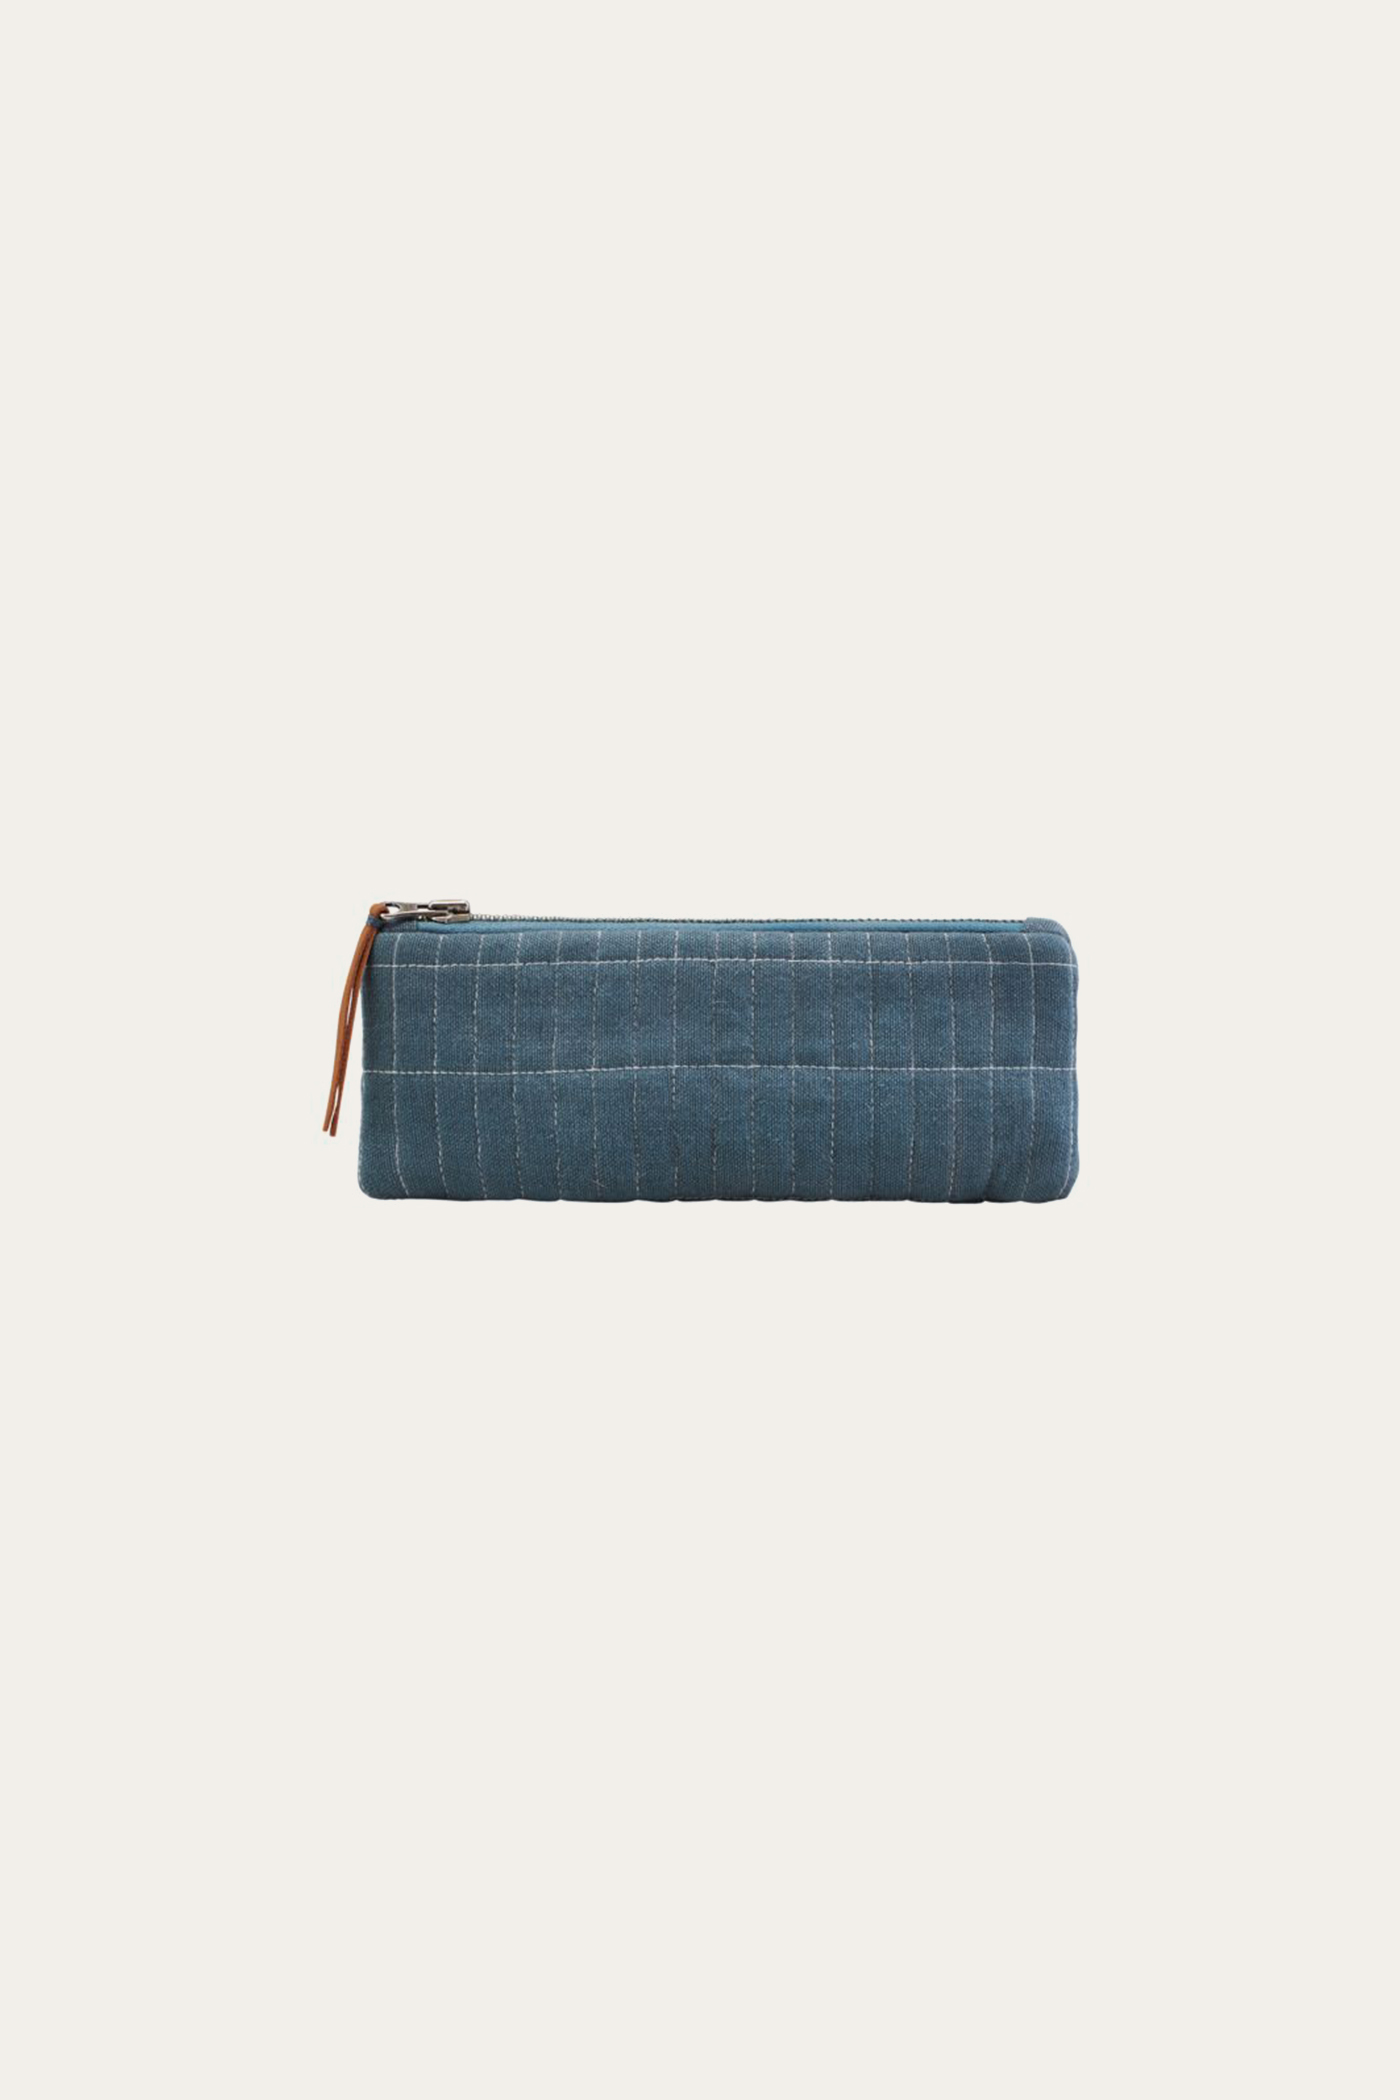 Monograph Pencil Case